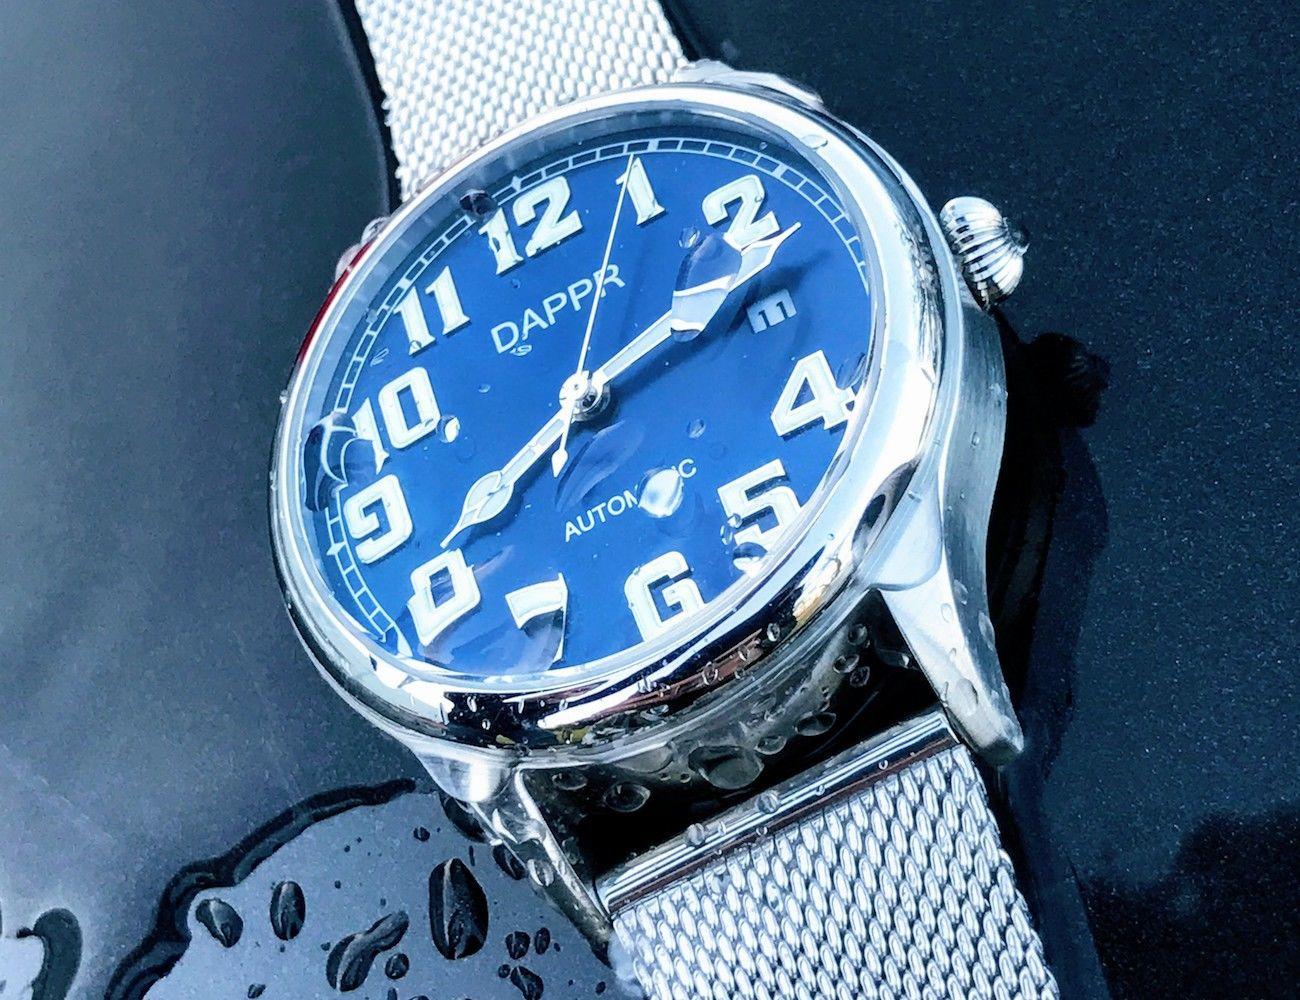 DAPPR Vintage Pilot Watch Collection